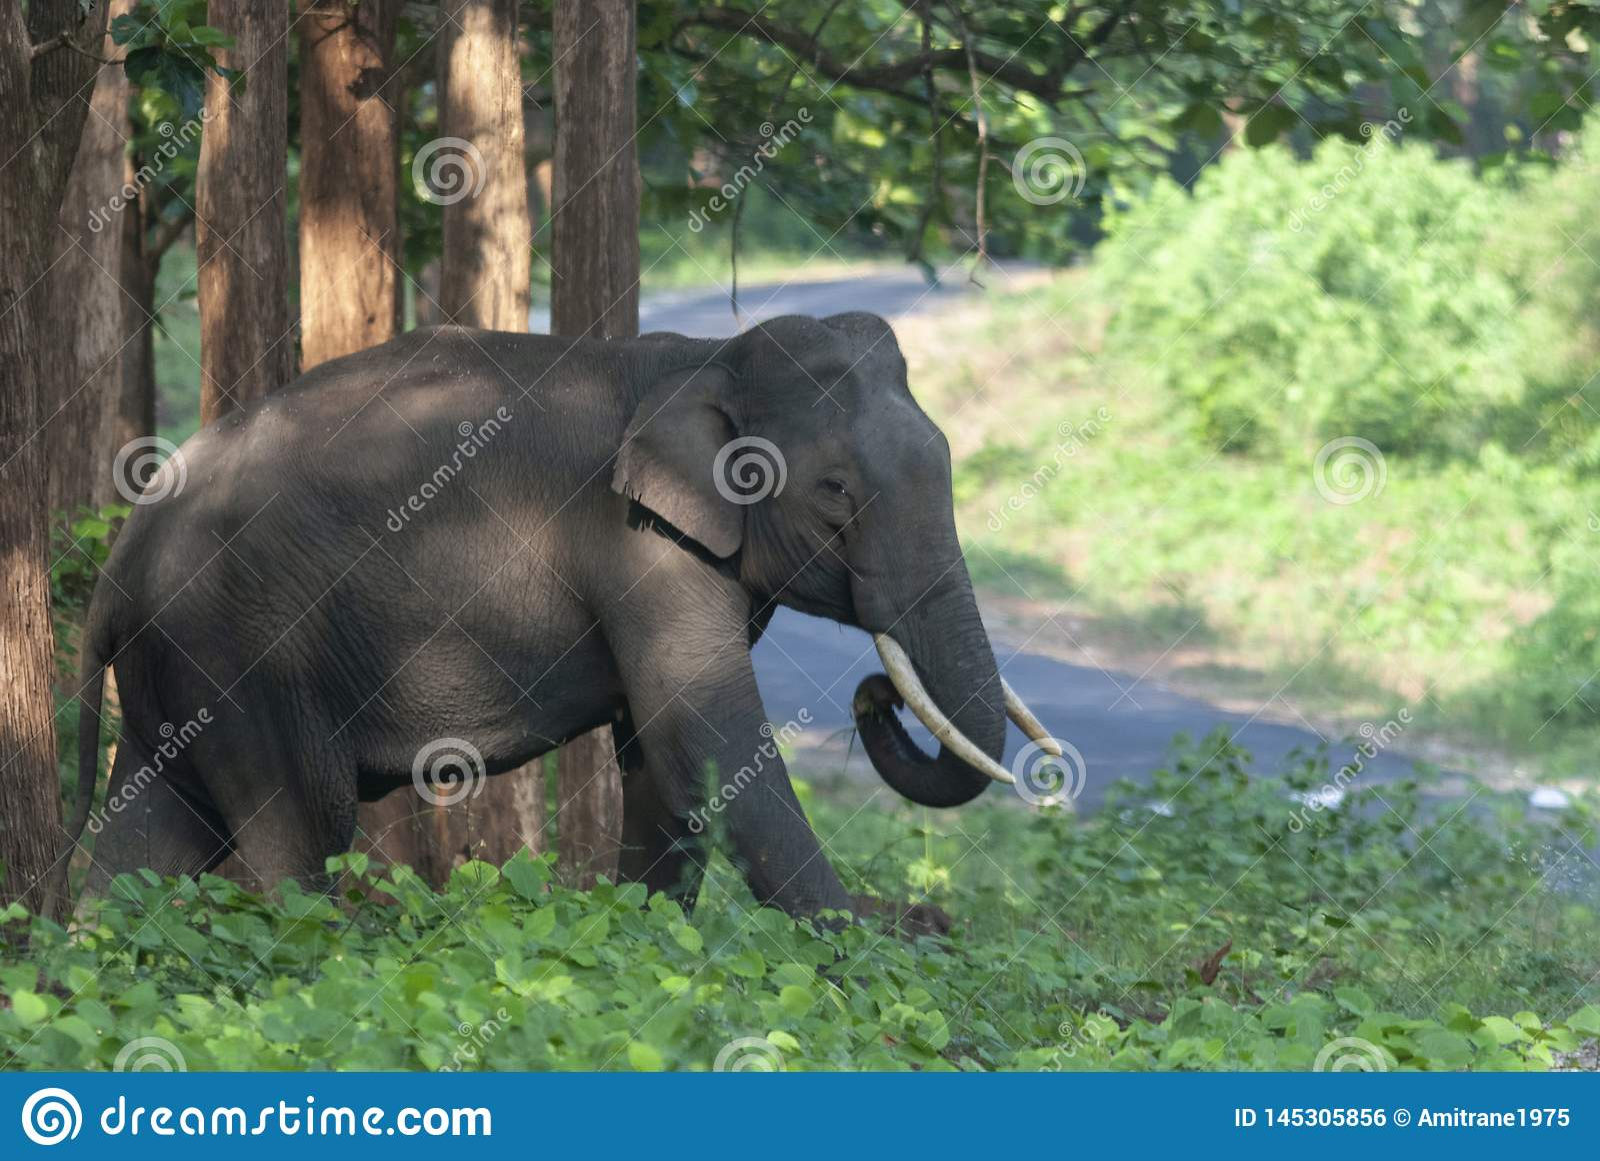 Incrocio di Tusker che esce da foresta, Kabini, Nagarhole, il Karnataka, India